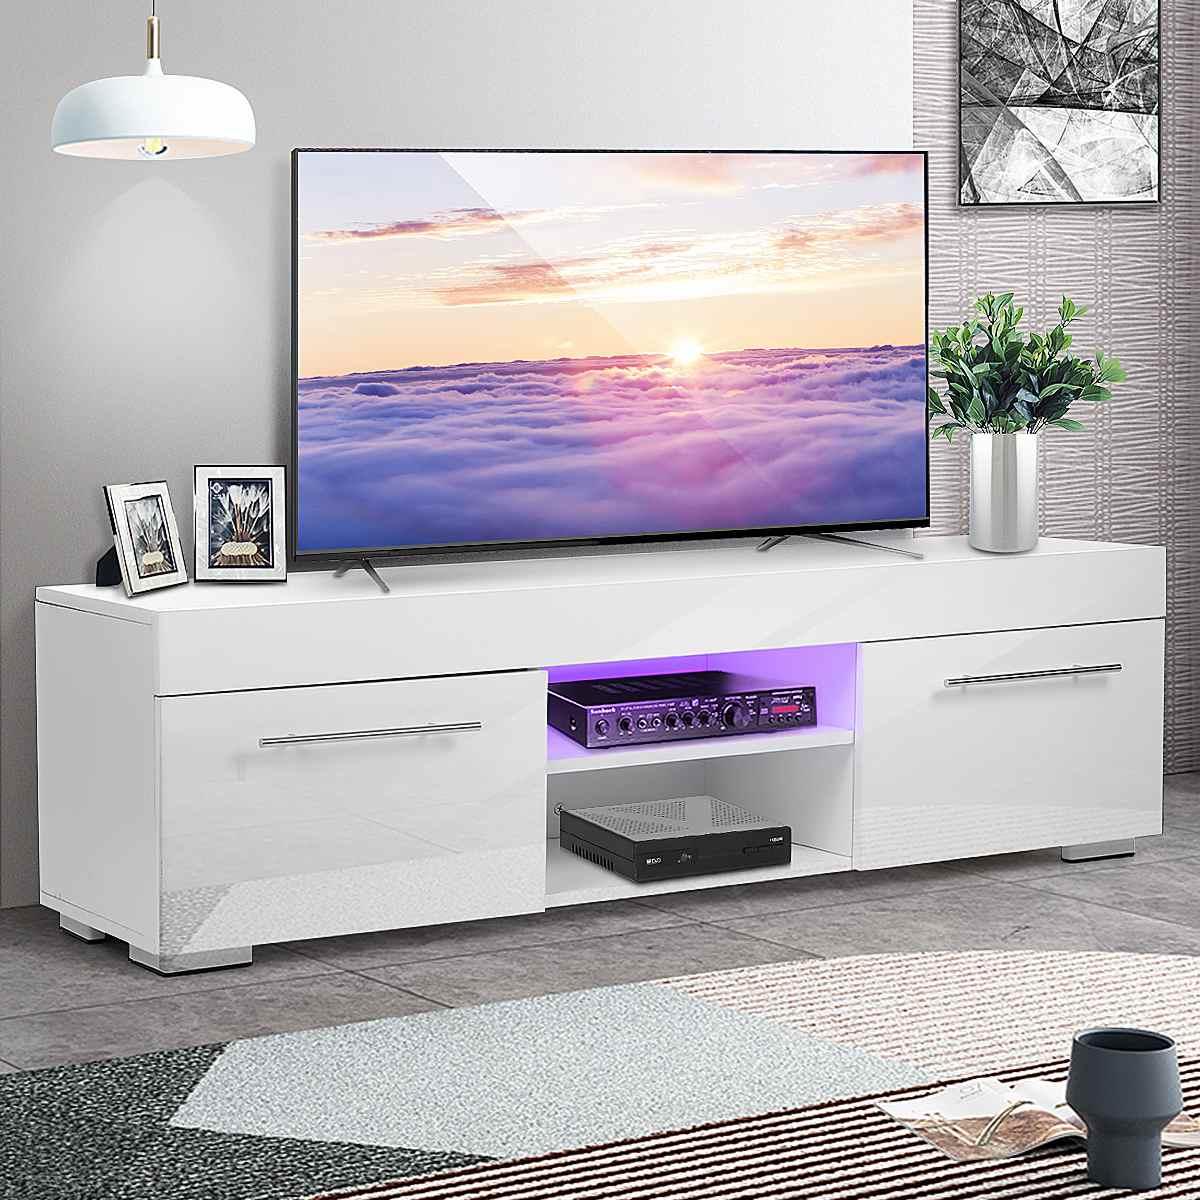 51 alto brillo Rectangular TV gabinete moderno LED TV Stands Sala muebles TV soporte con 2 cajones muebles del hogar